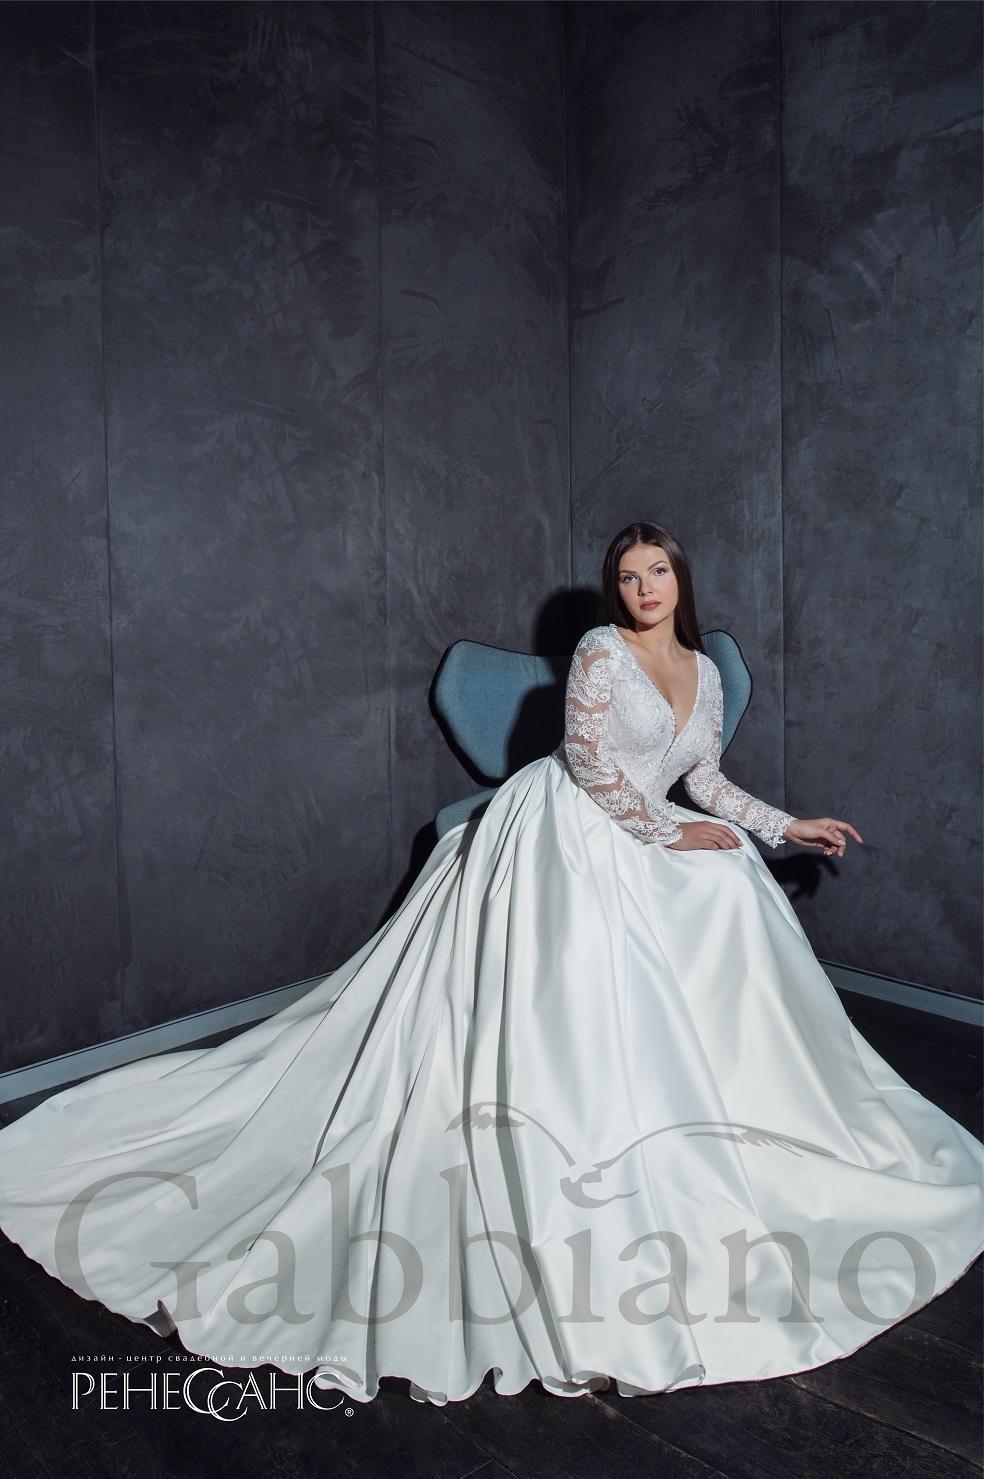 9a5a0d38ae6 1 фото. Glorietta. Классическое атласное свадебное платье ...